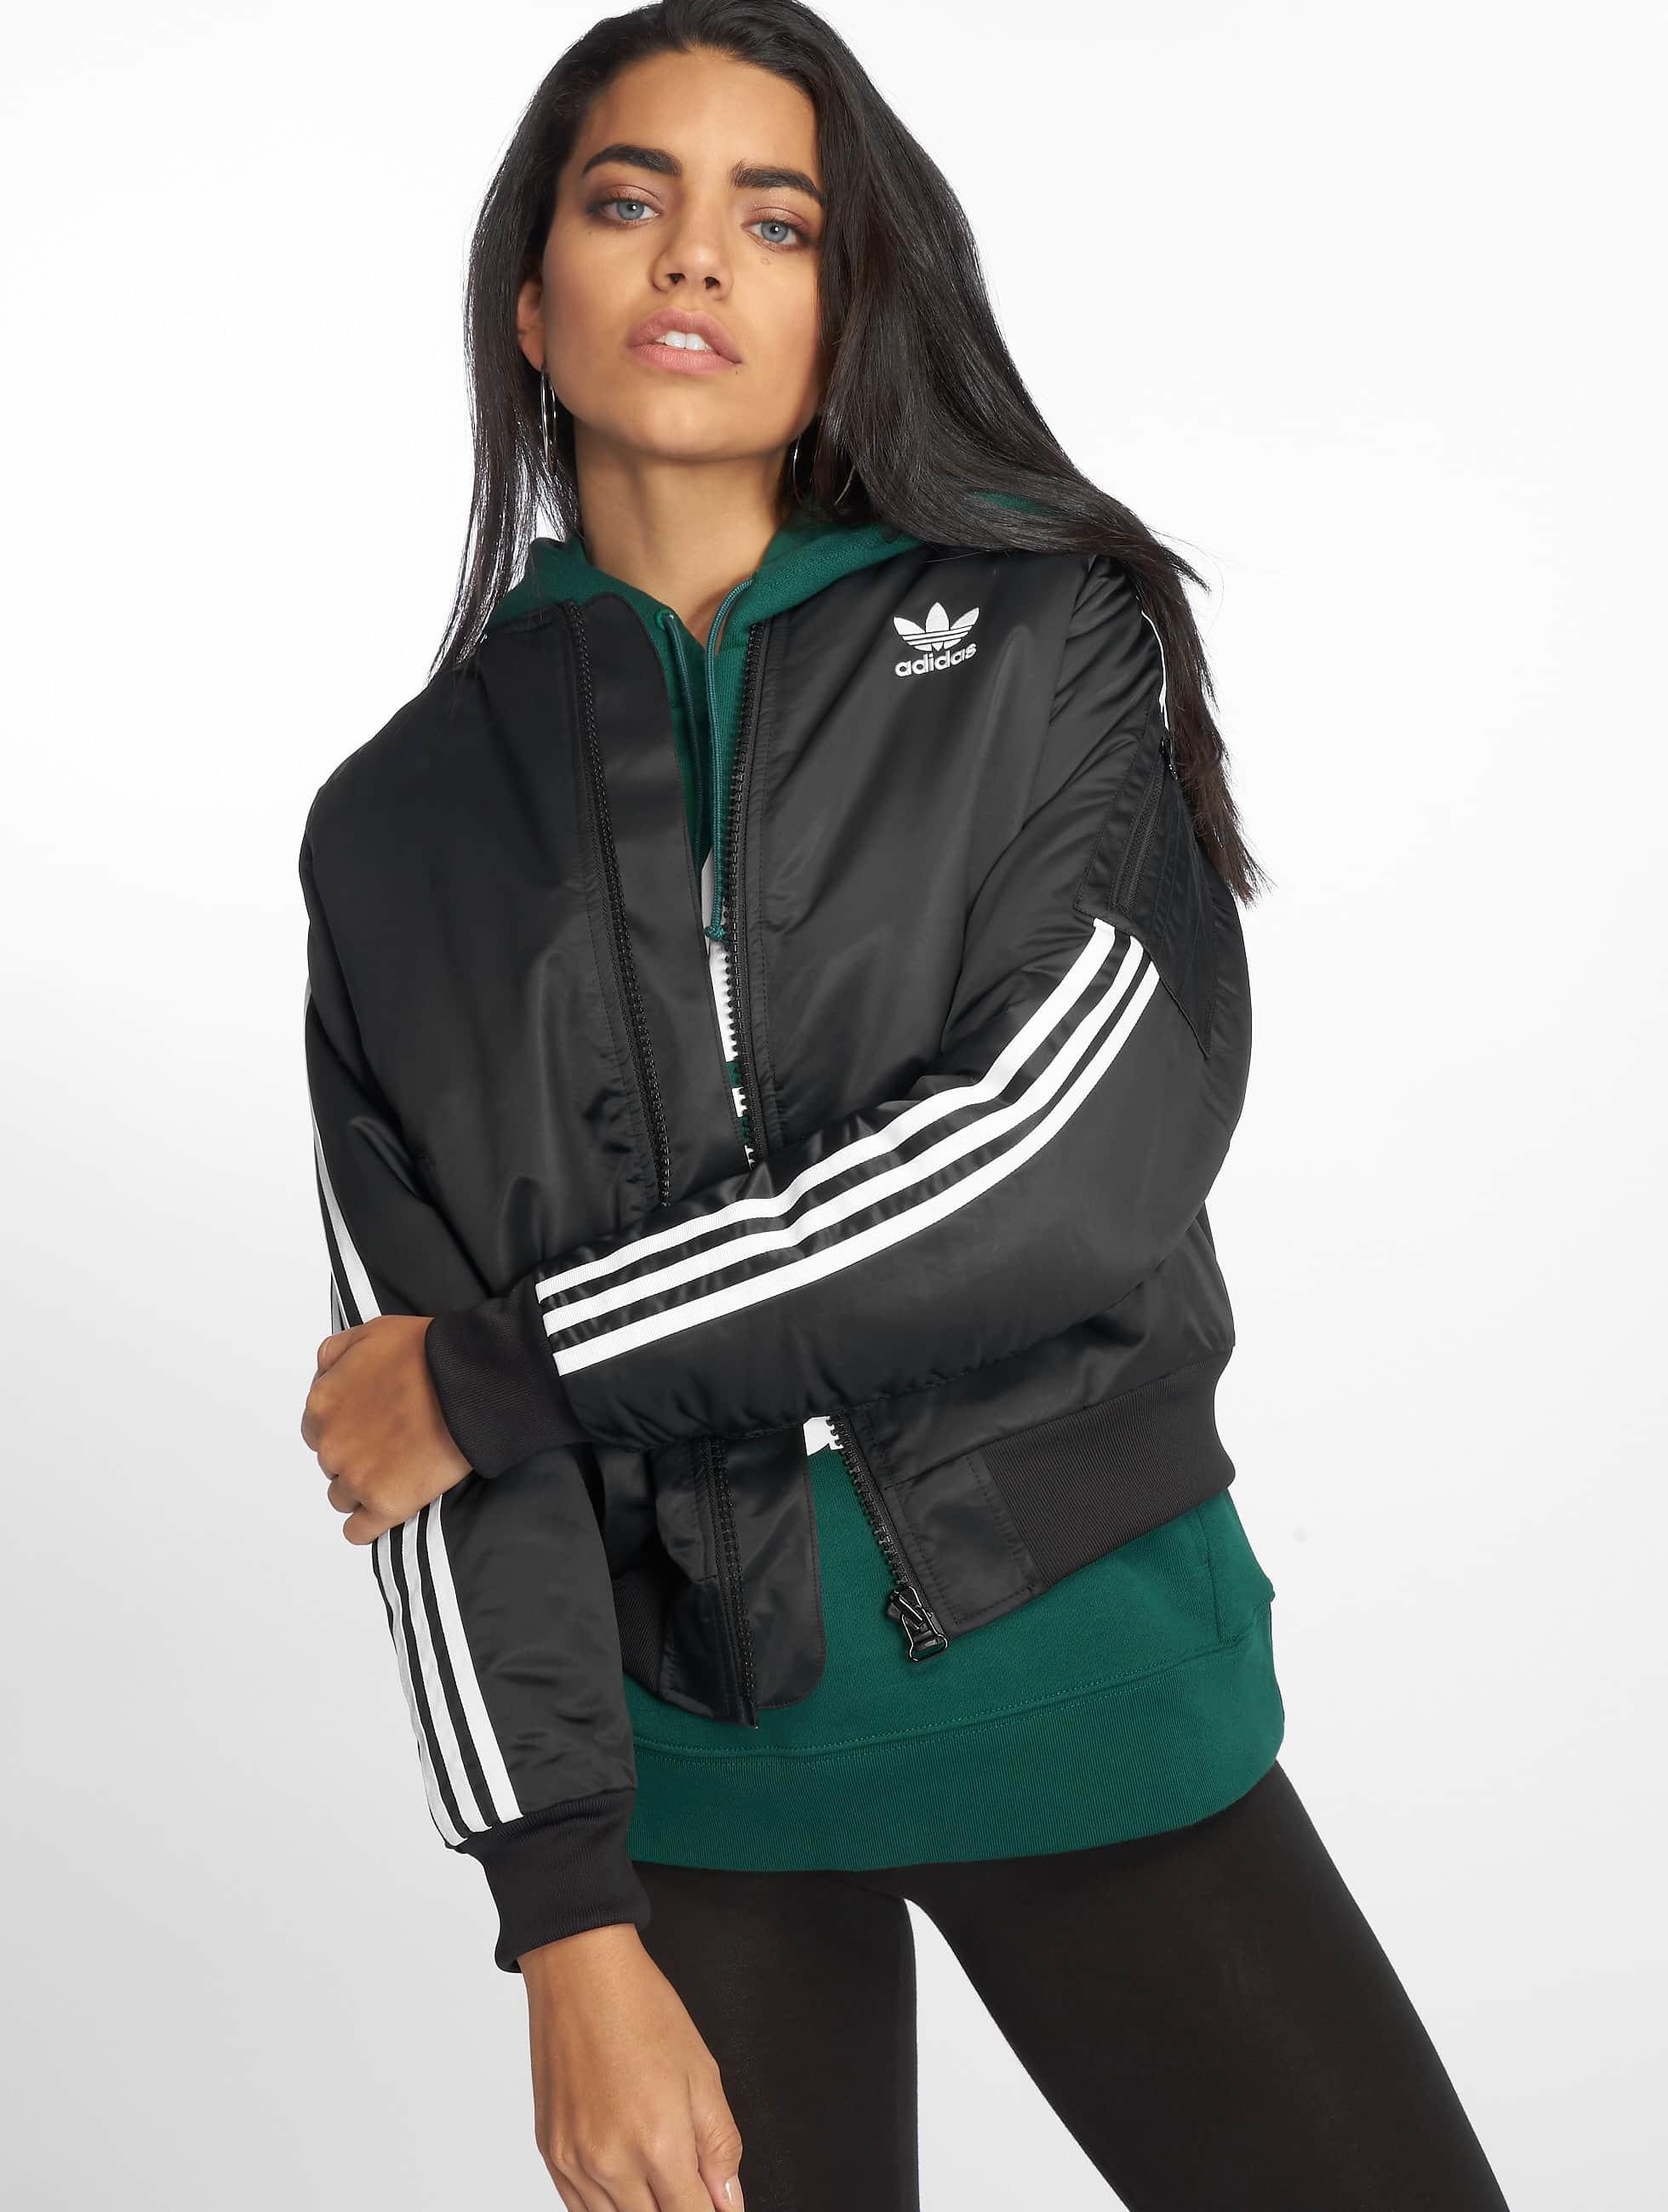 Dames Zomerjas Zwart.Adidas Originals Jas Zomerjas Bobmber In Zwart 543519